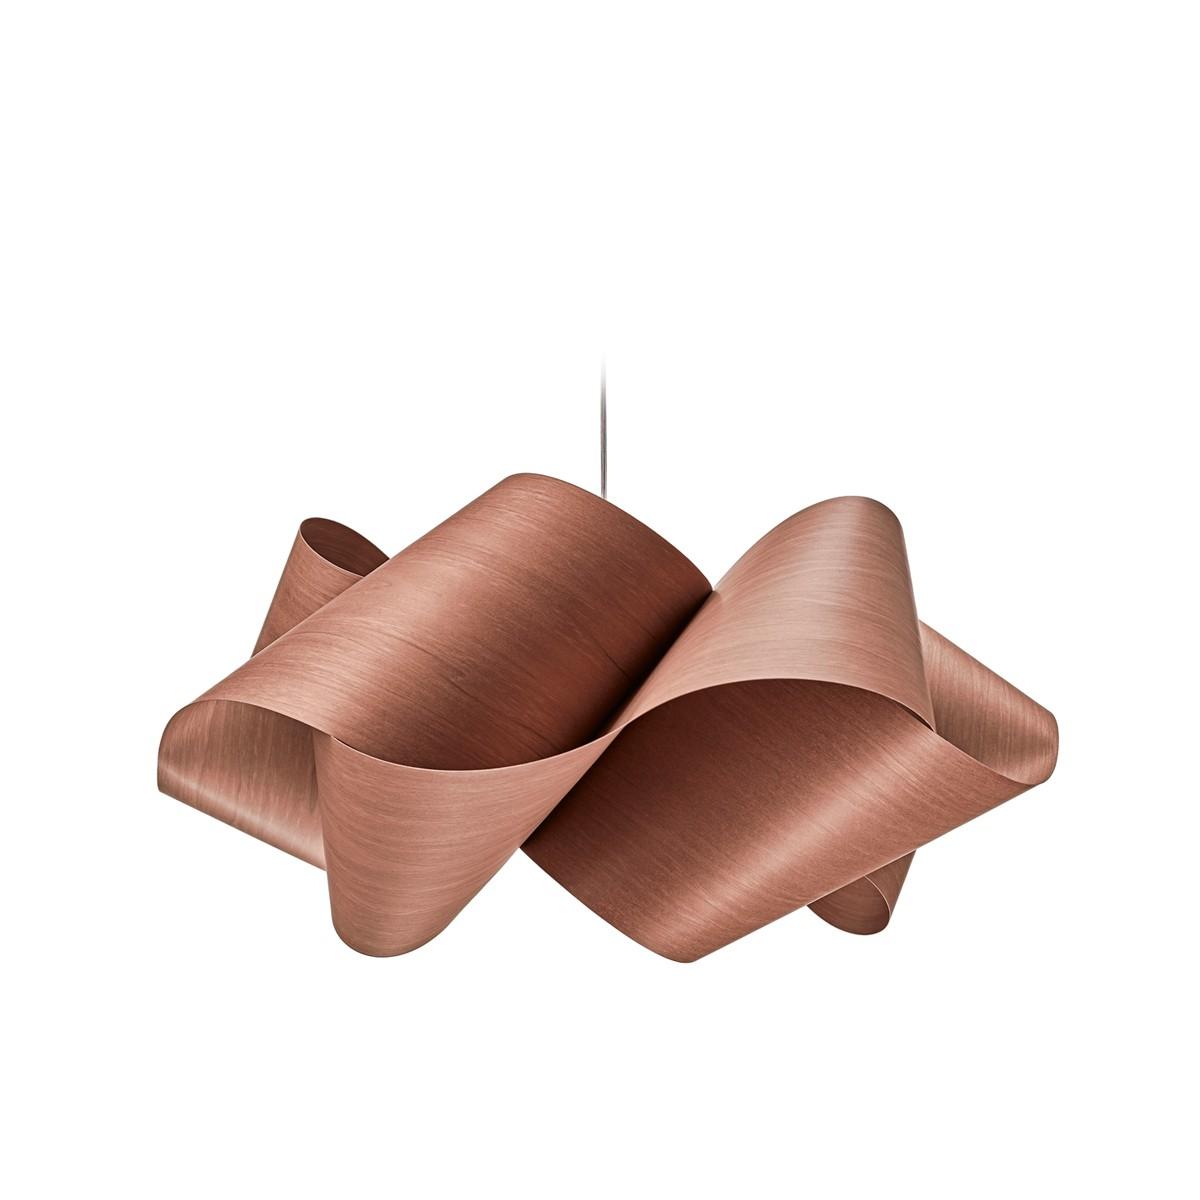 LZF Lamps Swirl Small Pendelleuchte, schokolade